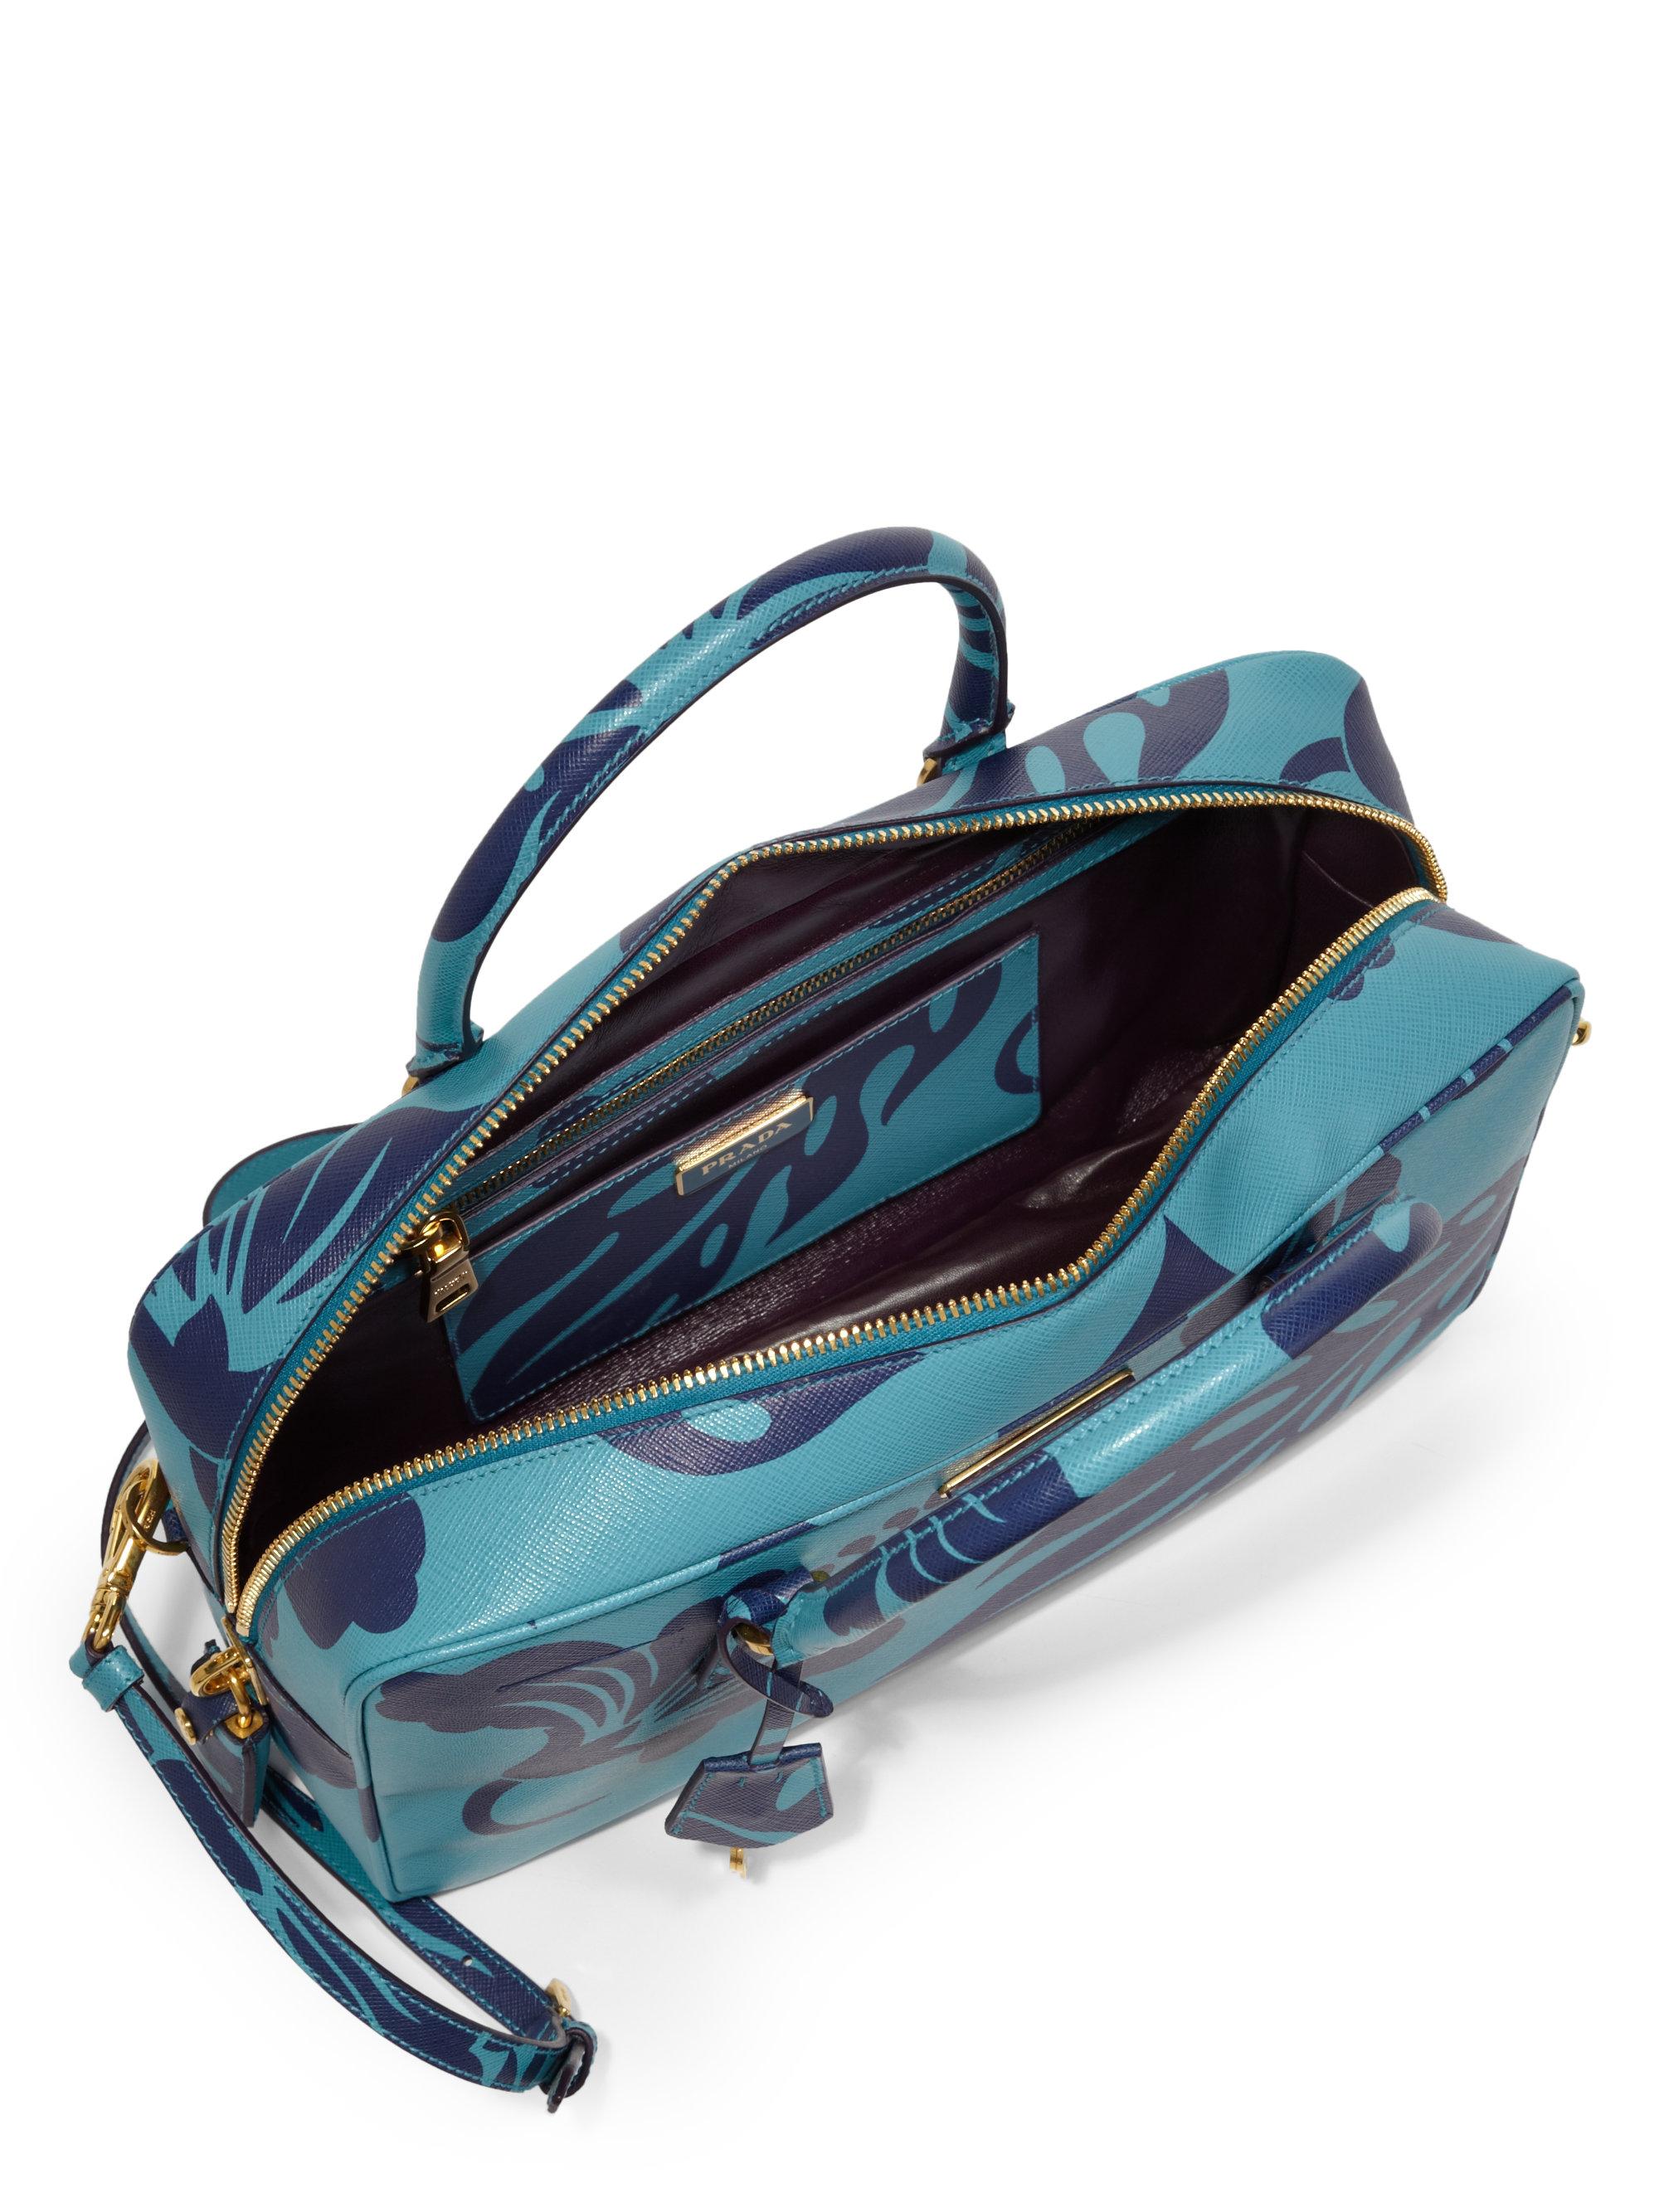 sell prada wallet - Prada Saffiano Print Tv Bag in Blue (TURQUOISE MULTI) | Lyst